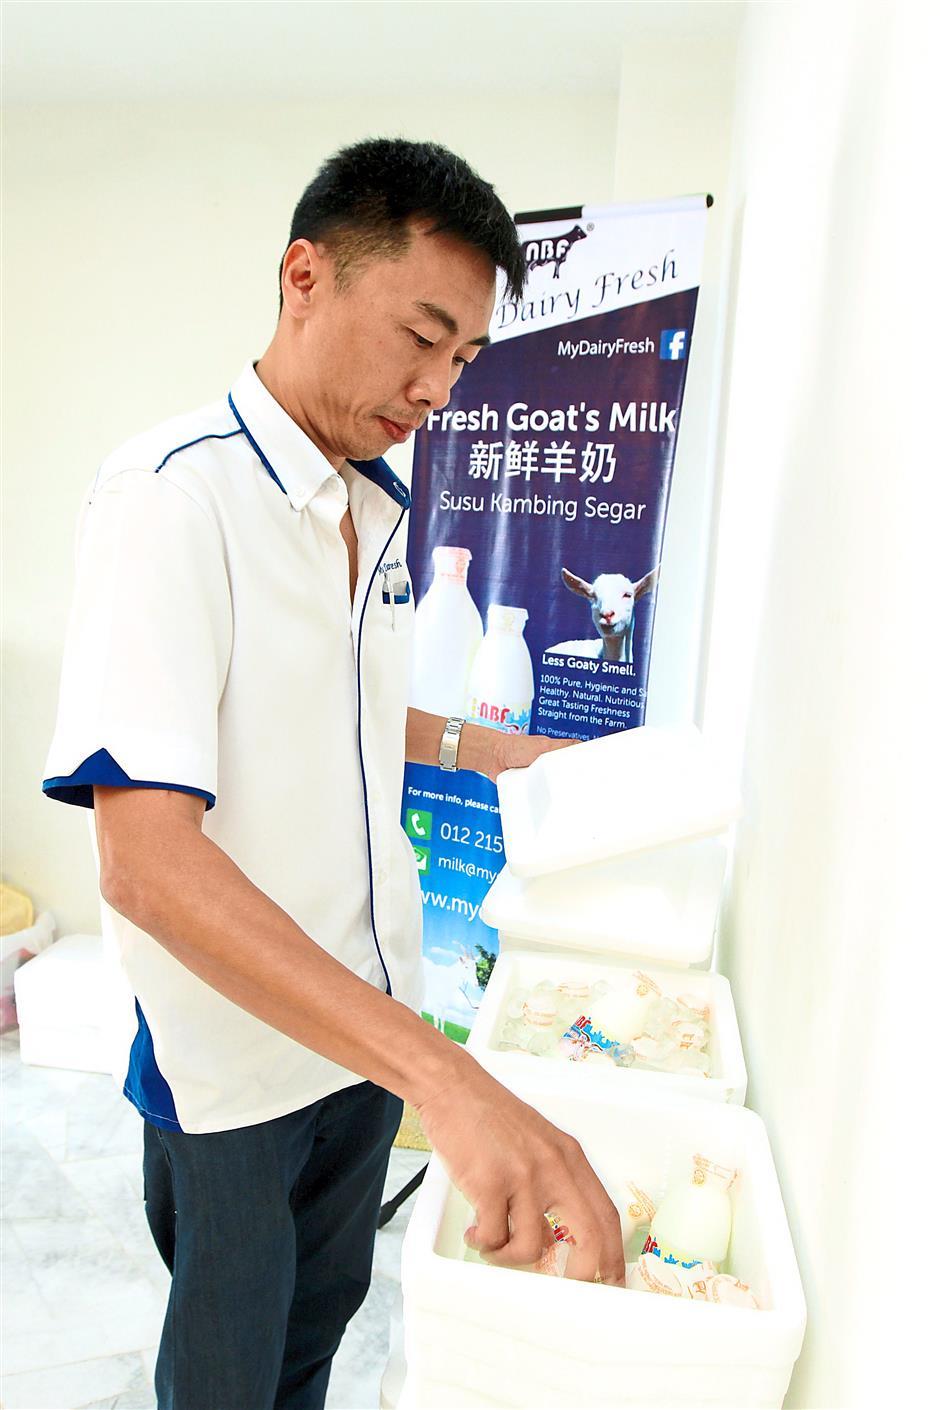 Organising his stock: Lai storing bottles of goat's milk in ice boxes.